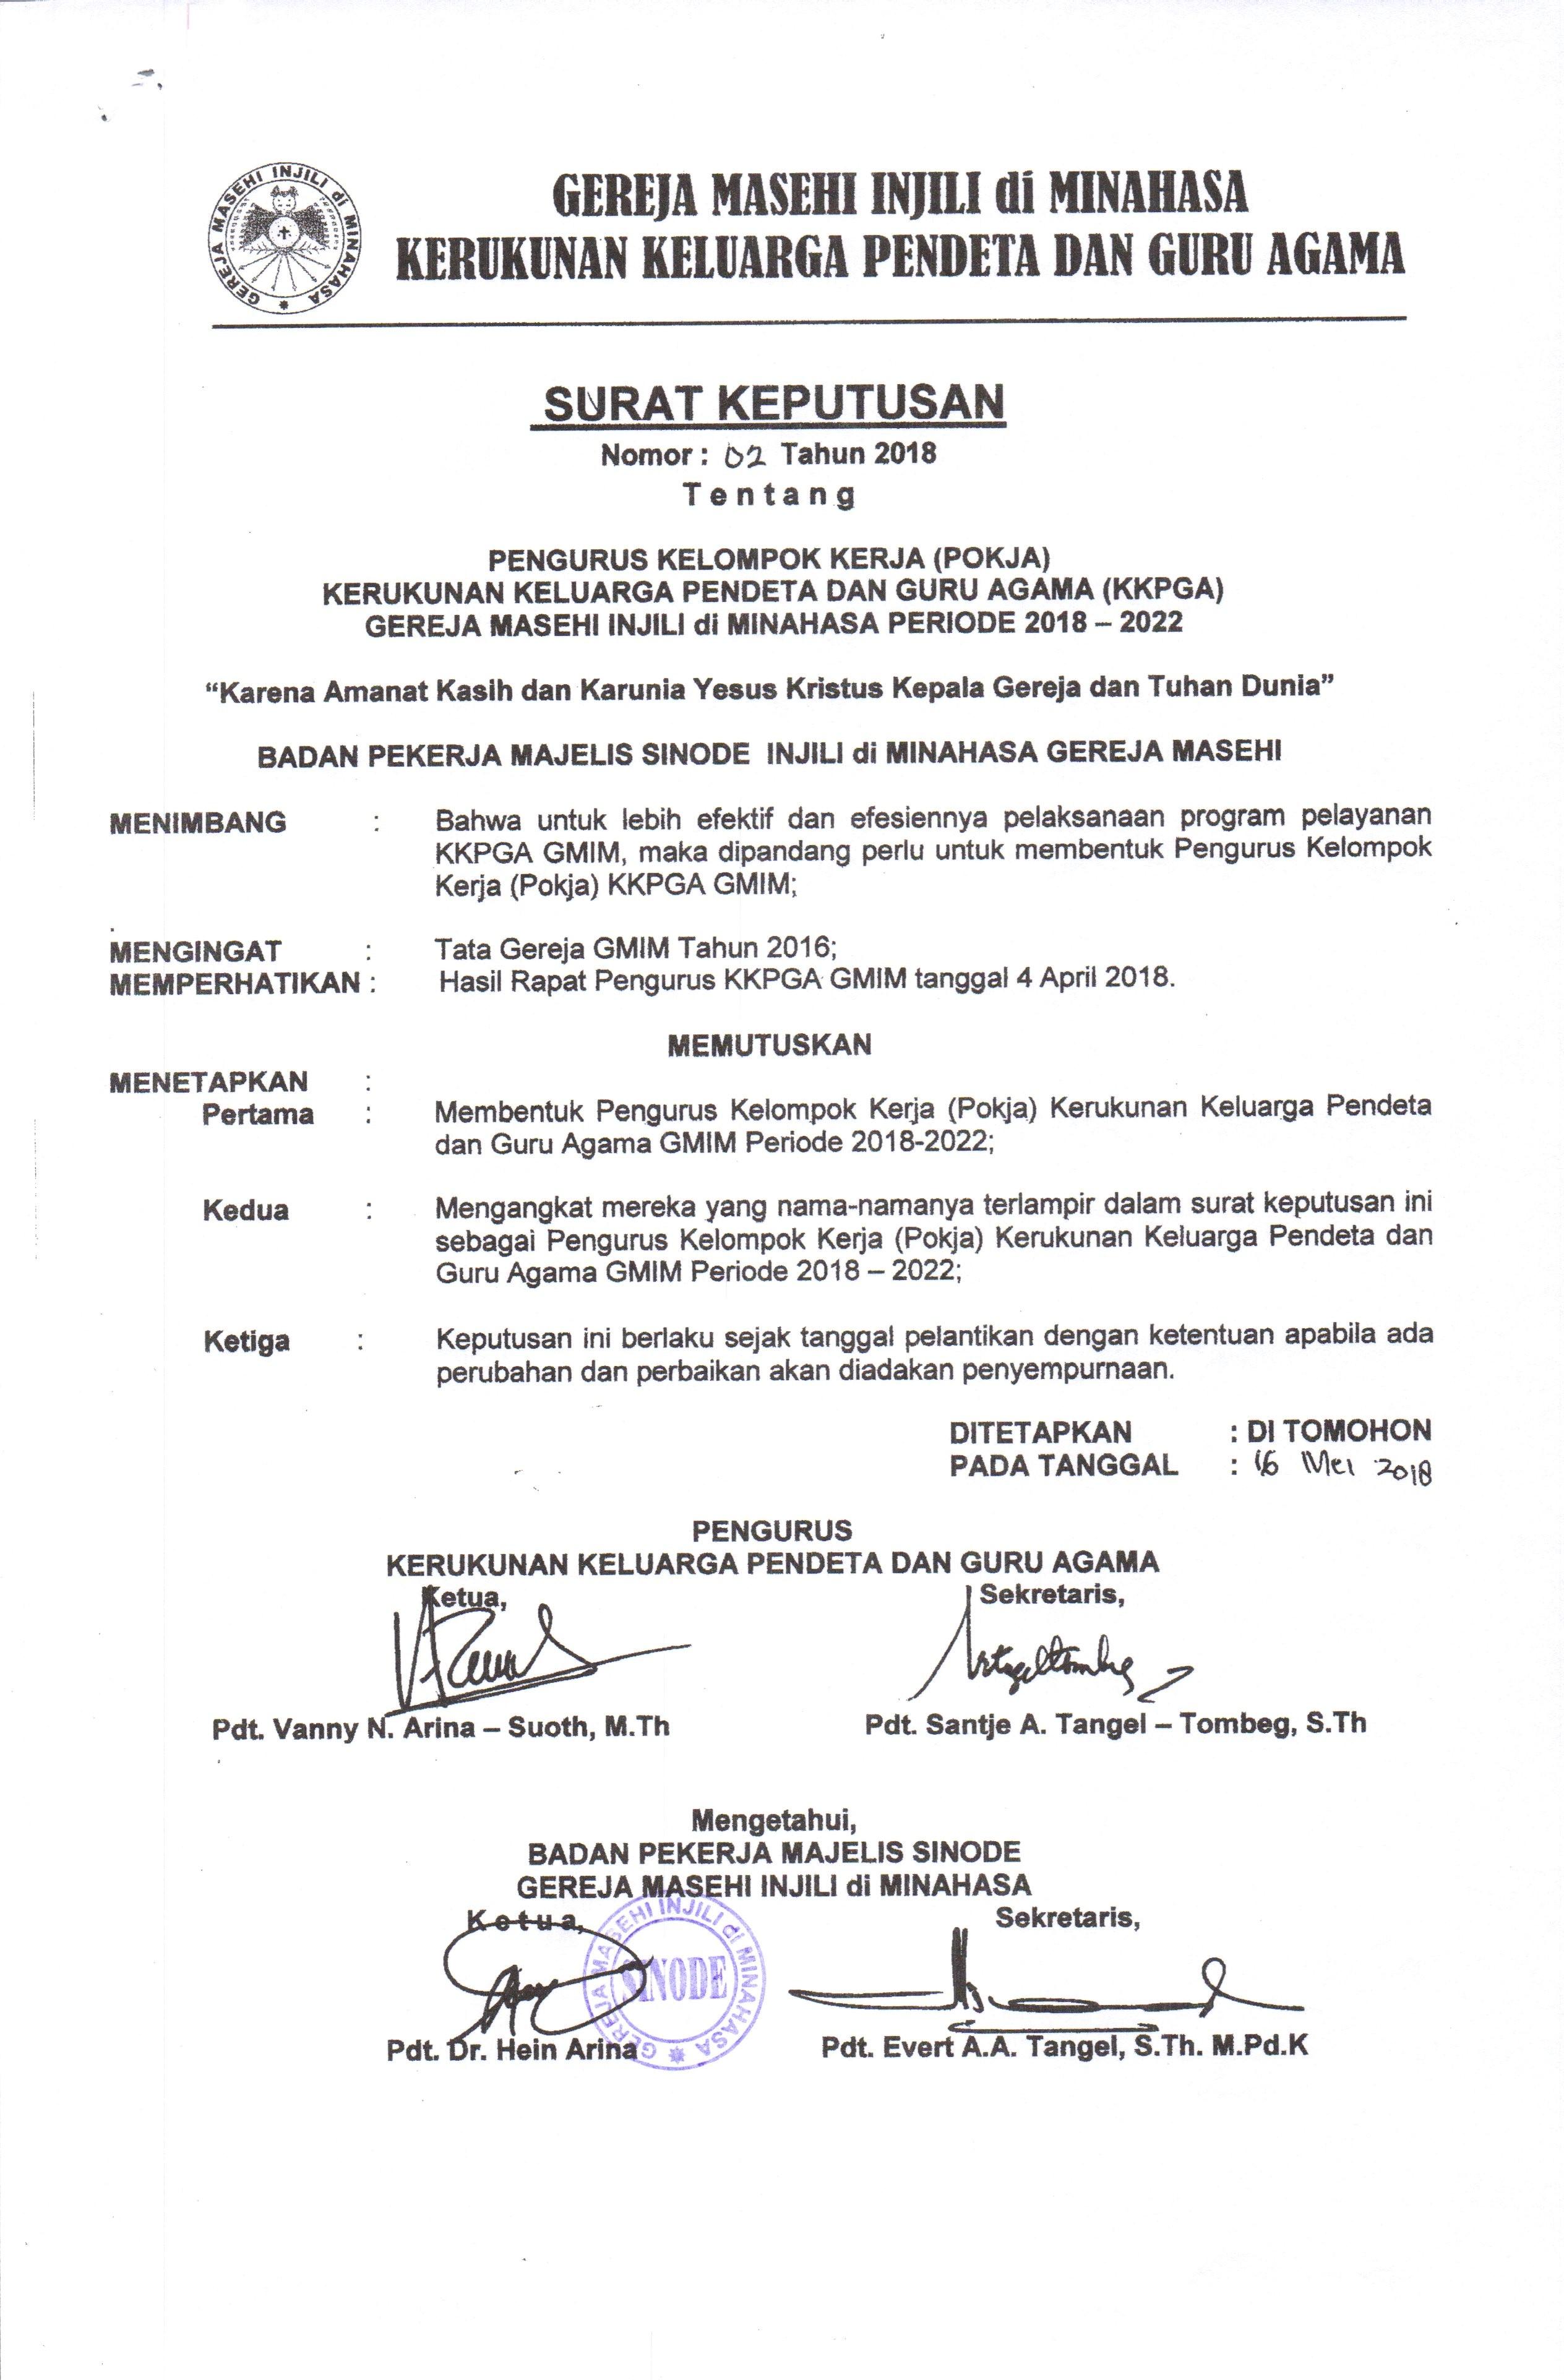 Surat Keputusan Tentang Pengurus Kelompok Kerja Pokja